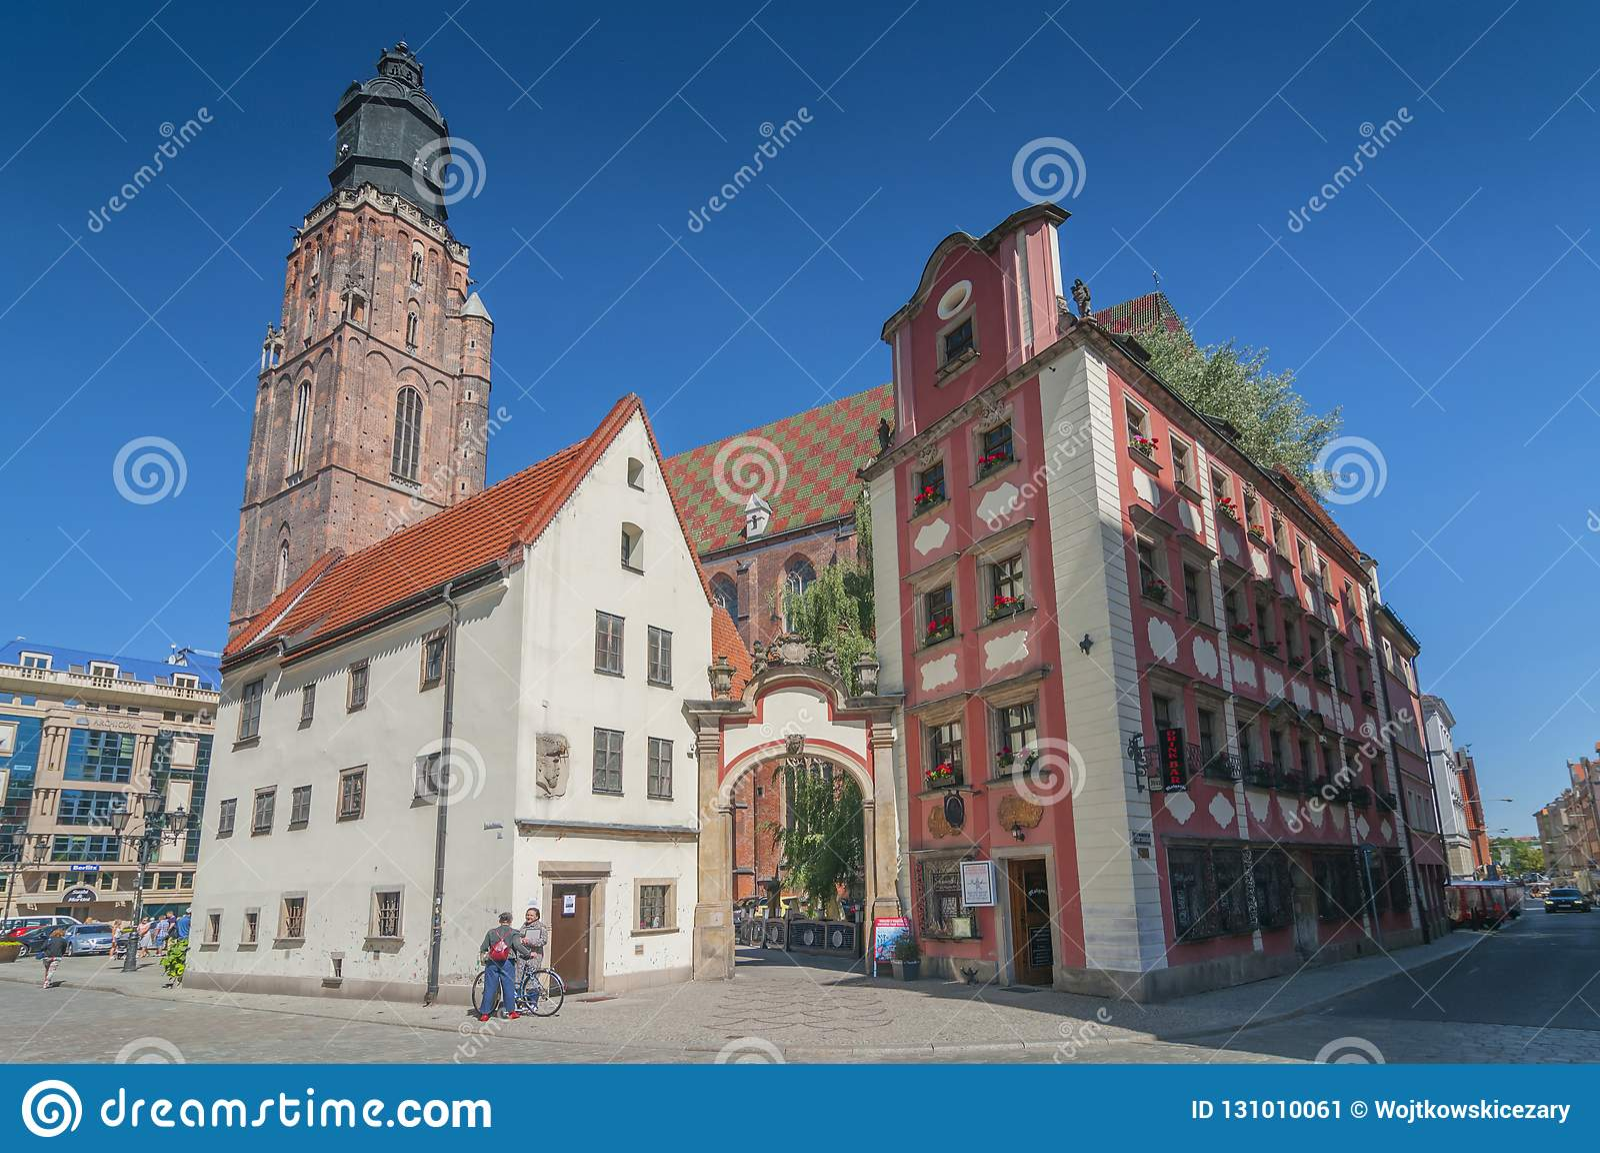 Jas και Malgosia Johnny και μικροσκοπική εκκλησία σπιτιών της Mary και του ST Elizabeth σε Wroclaw, Σιλεσία, Πολωνία